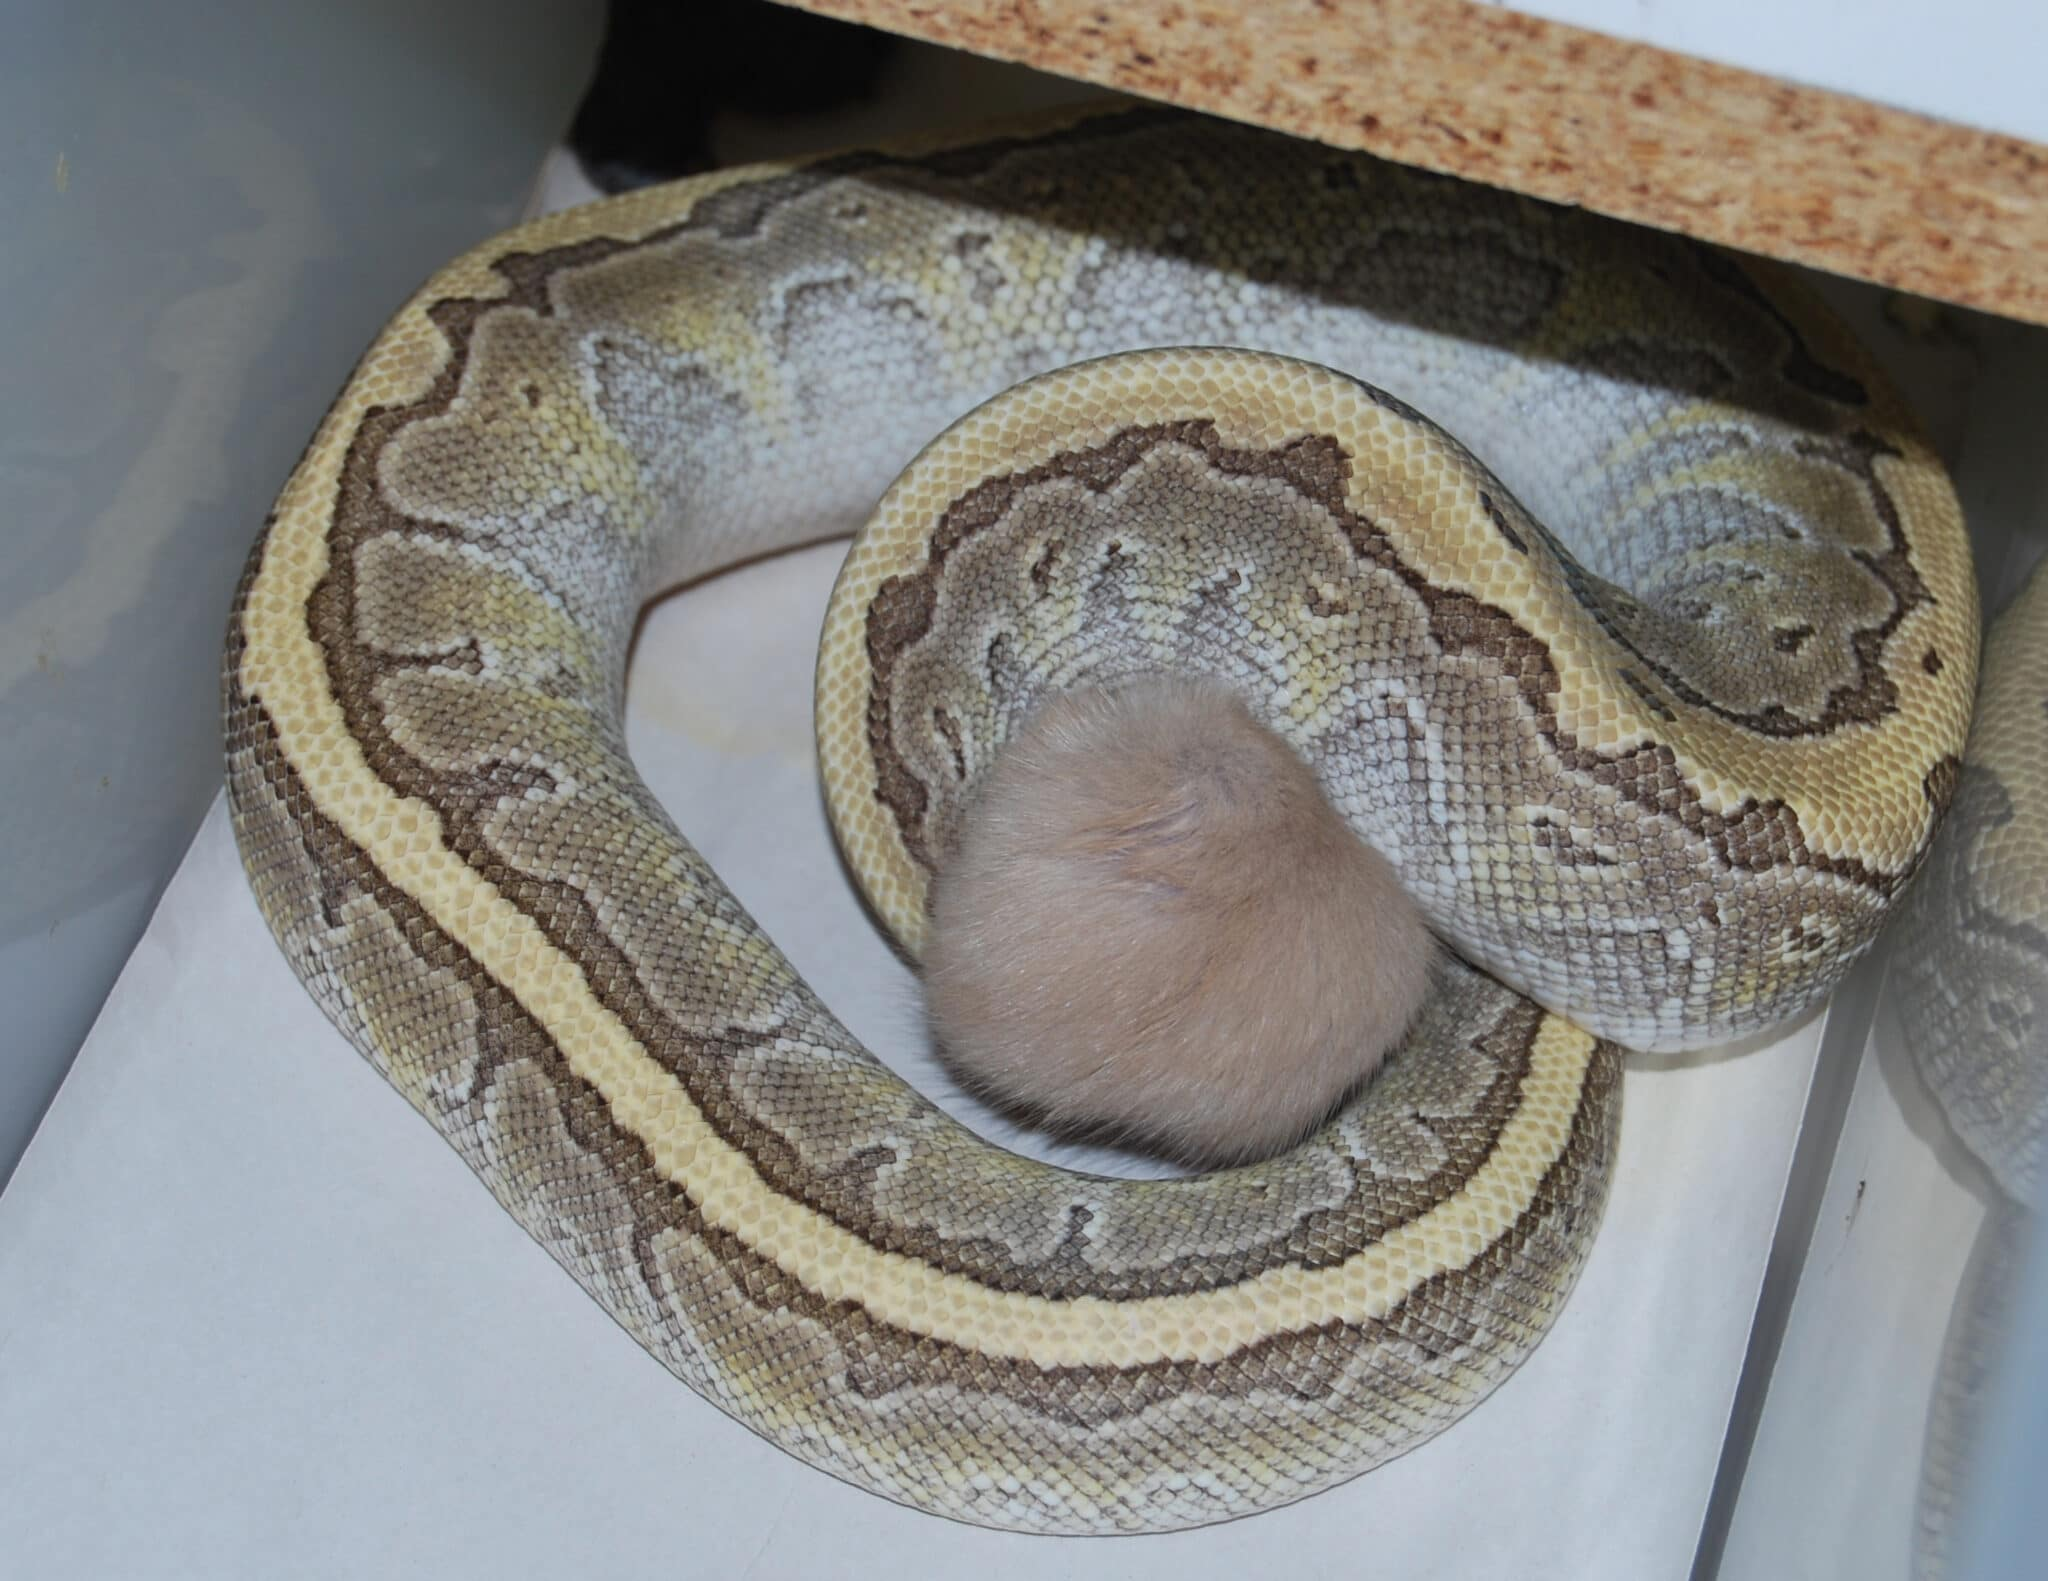 Lesser pinstripe Ball Python eating